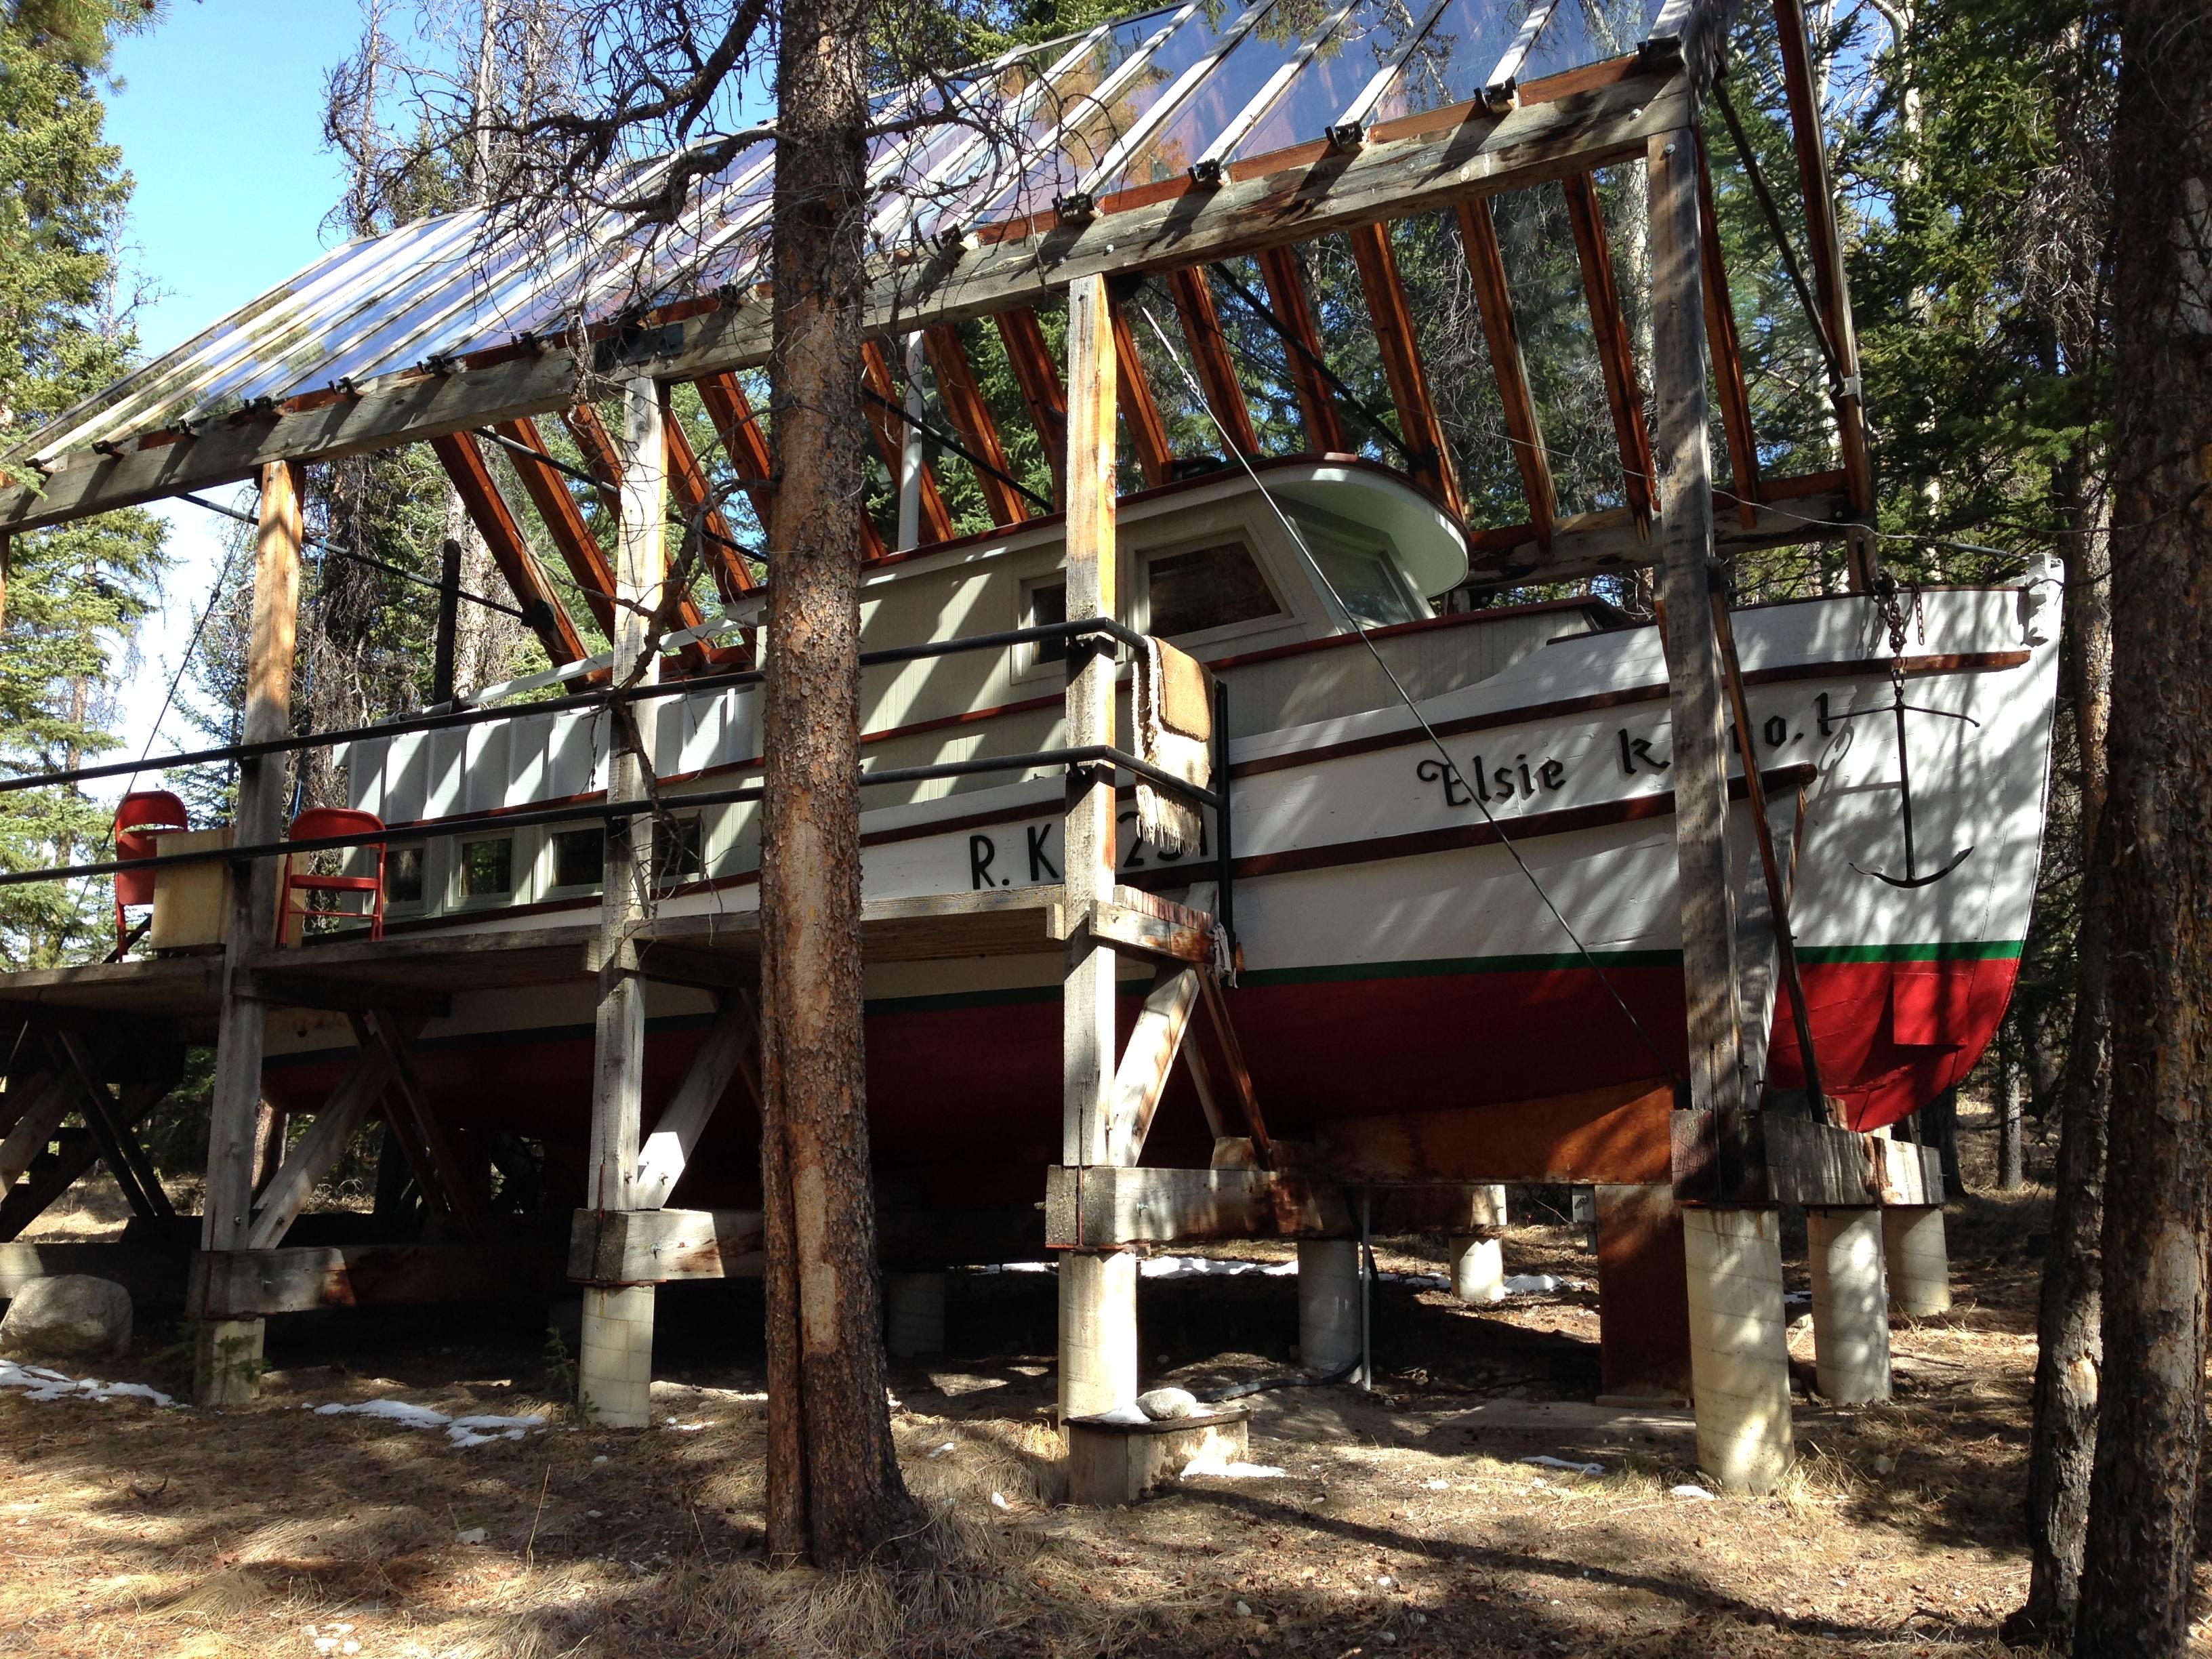 Life of Pi boat - Banff